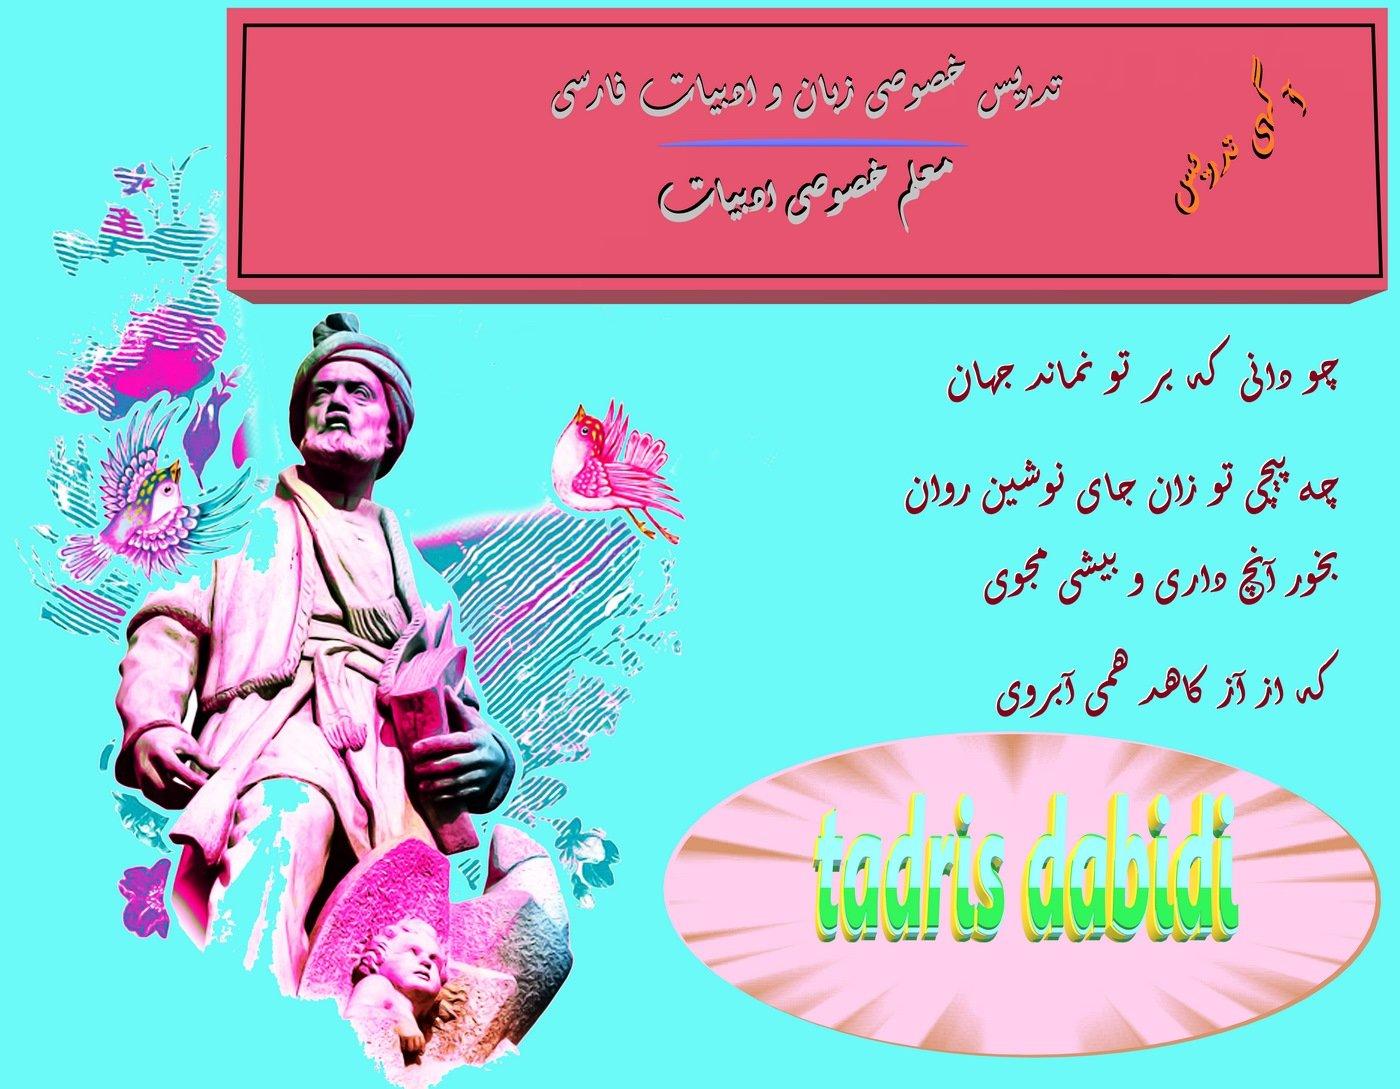 تدریس خصوصی زبان و ادبیات فارسی و معلم خصوصی ادبیات